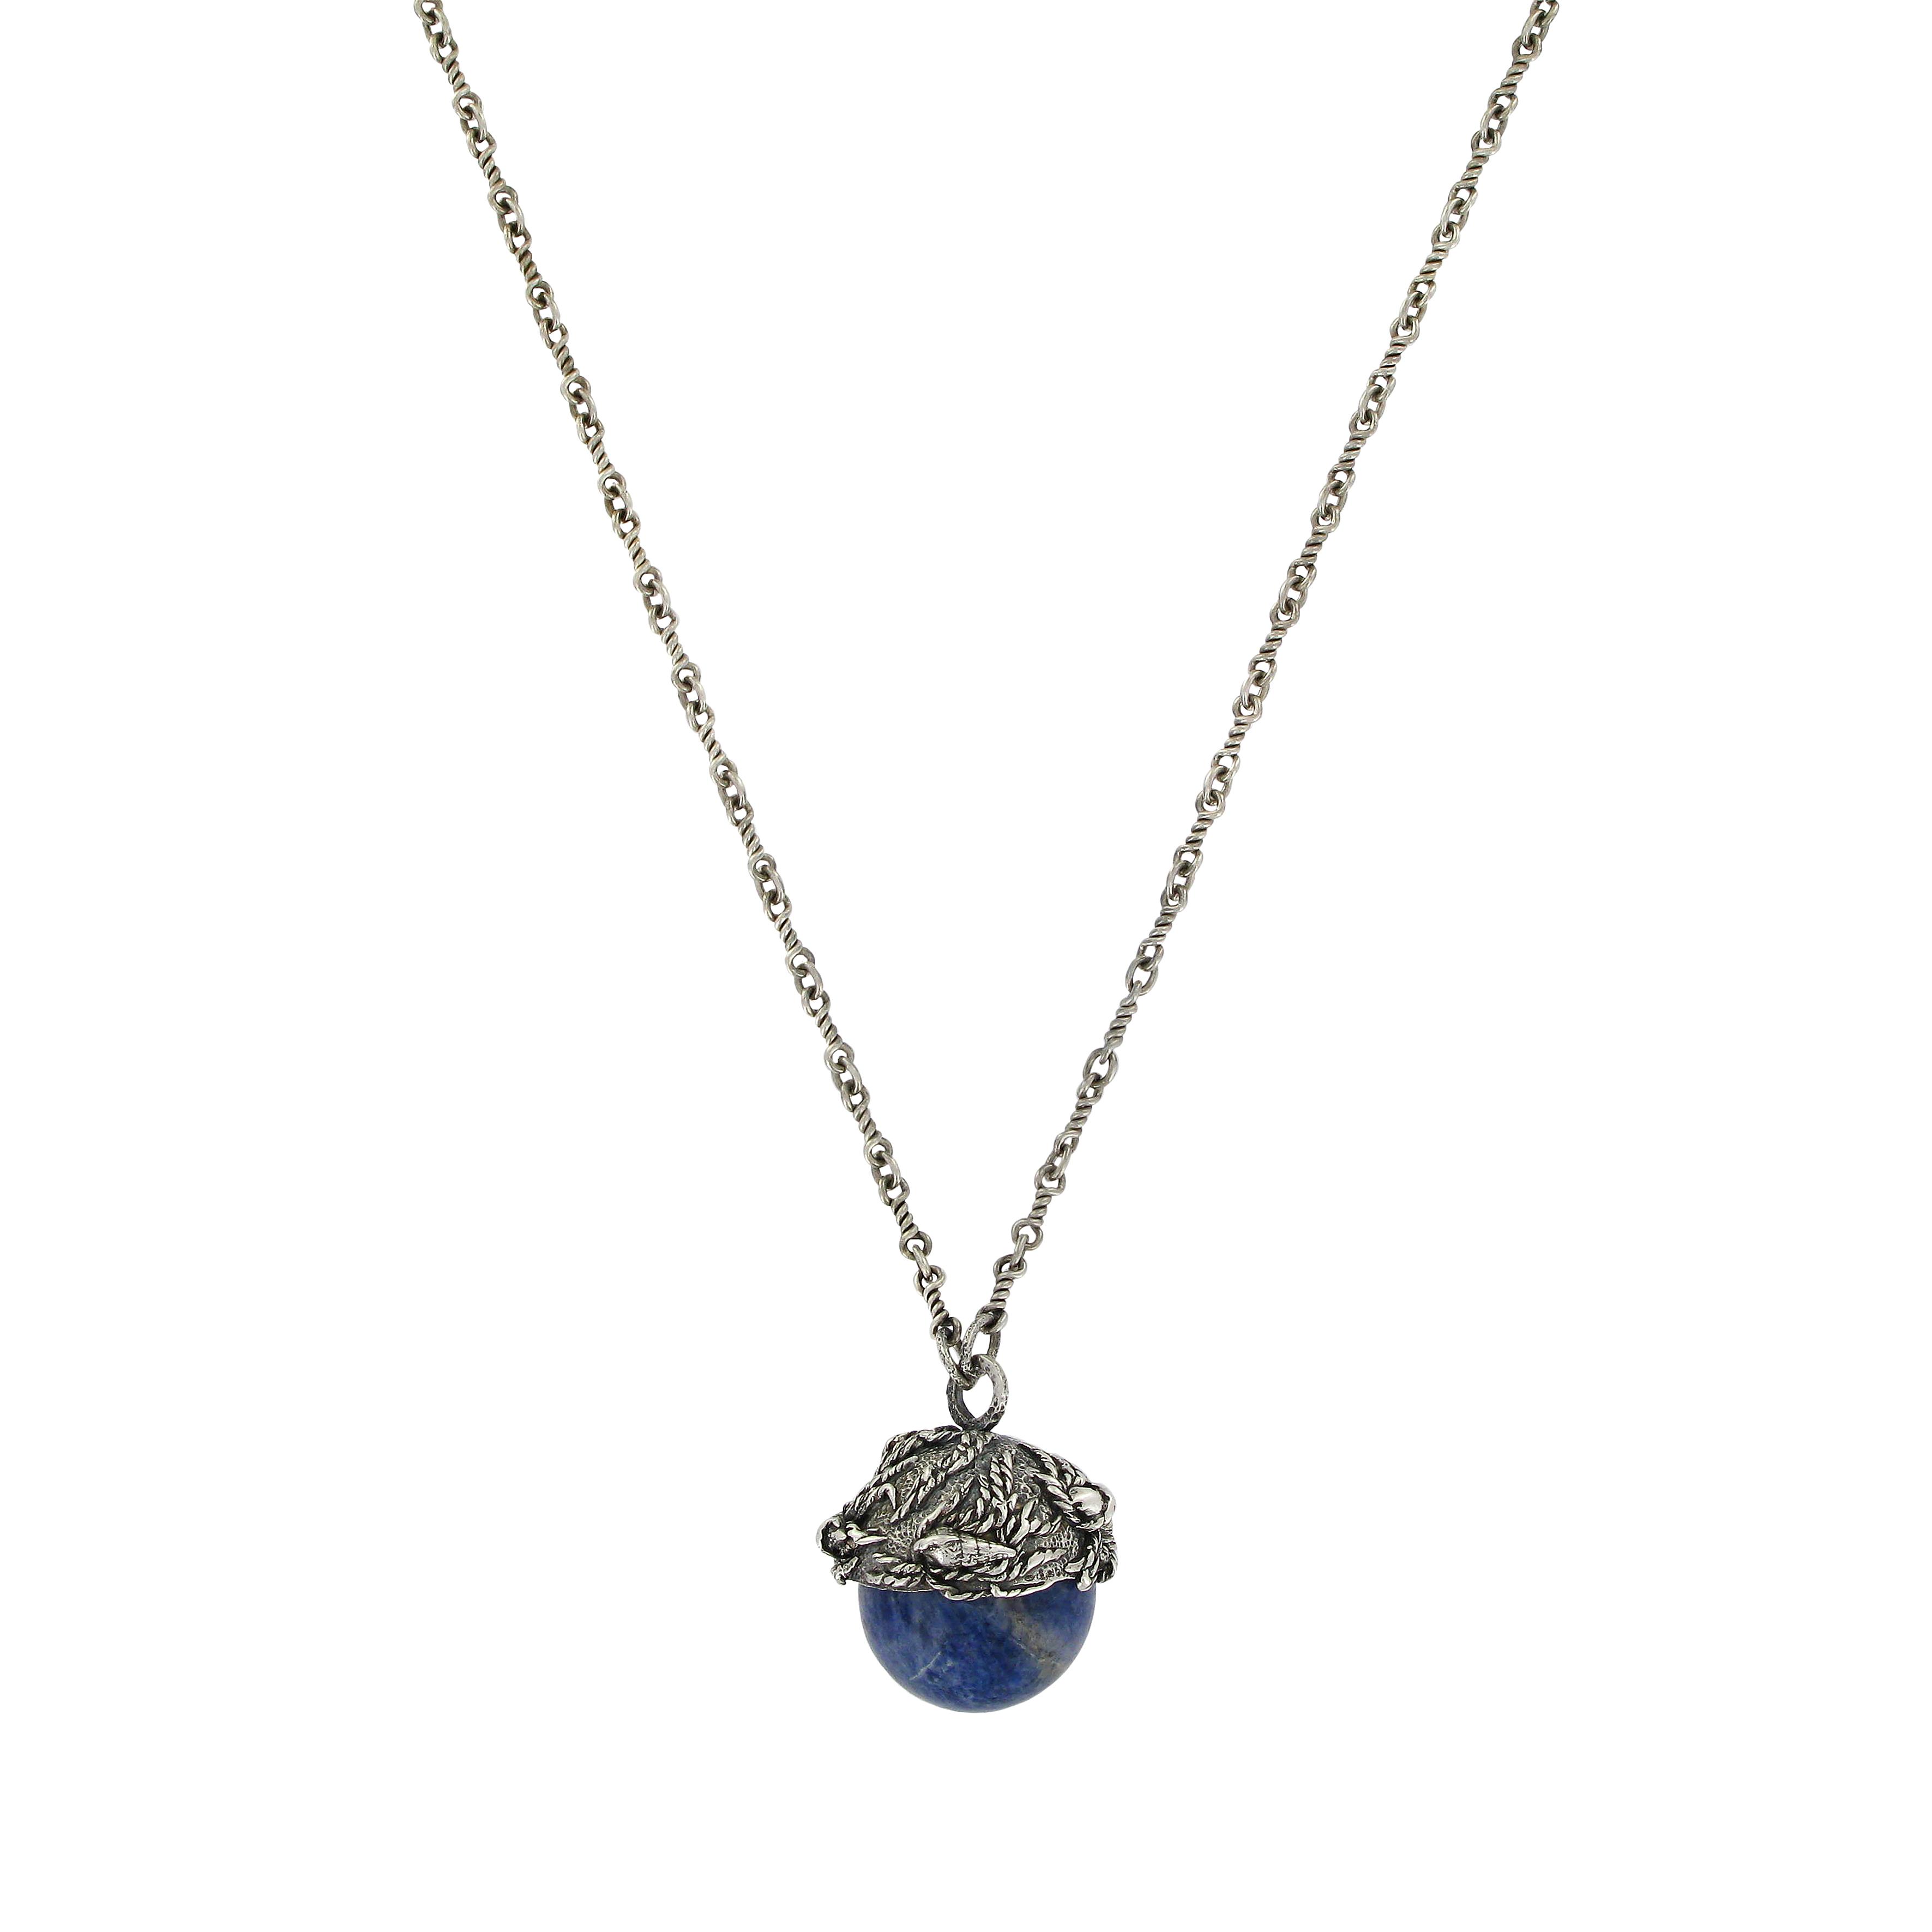 Seascape sodalite pendant necklace